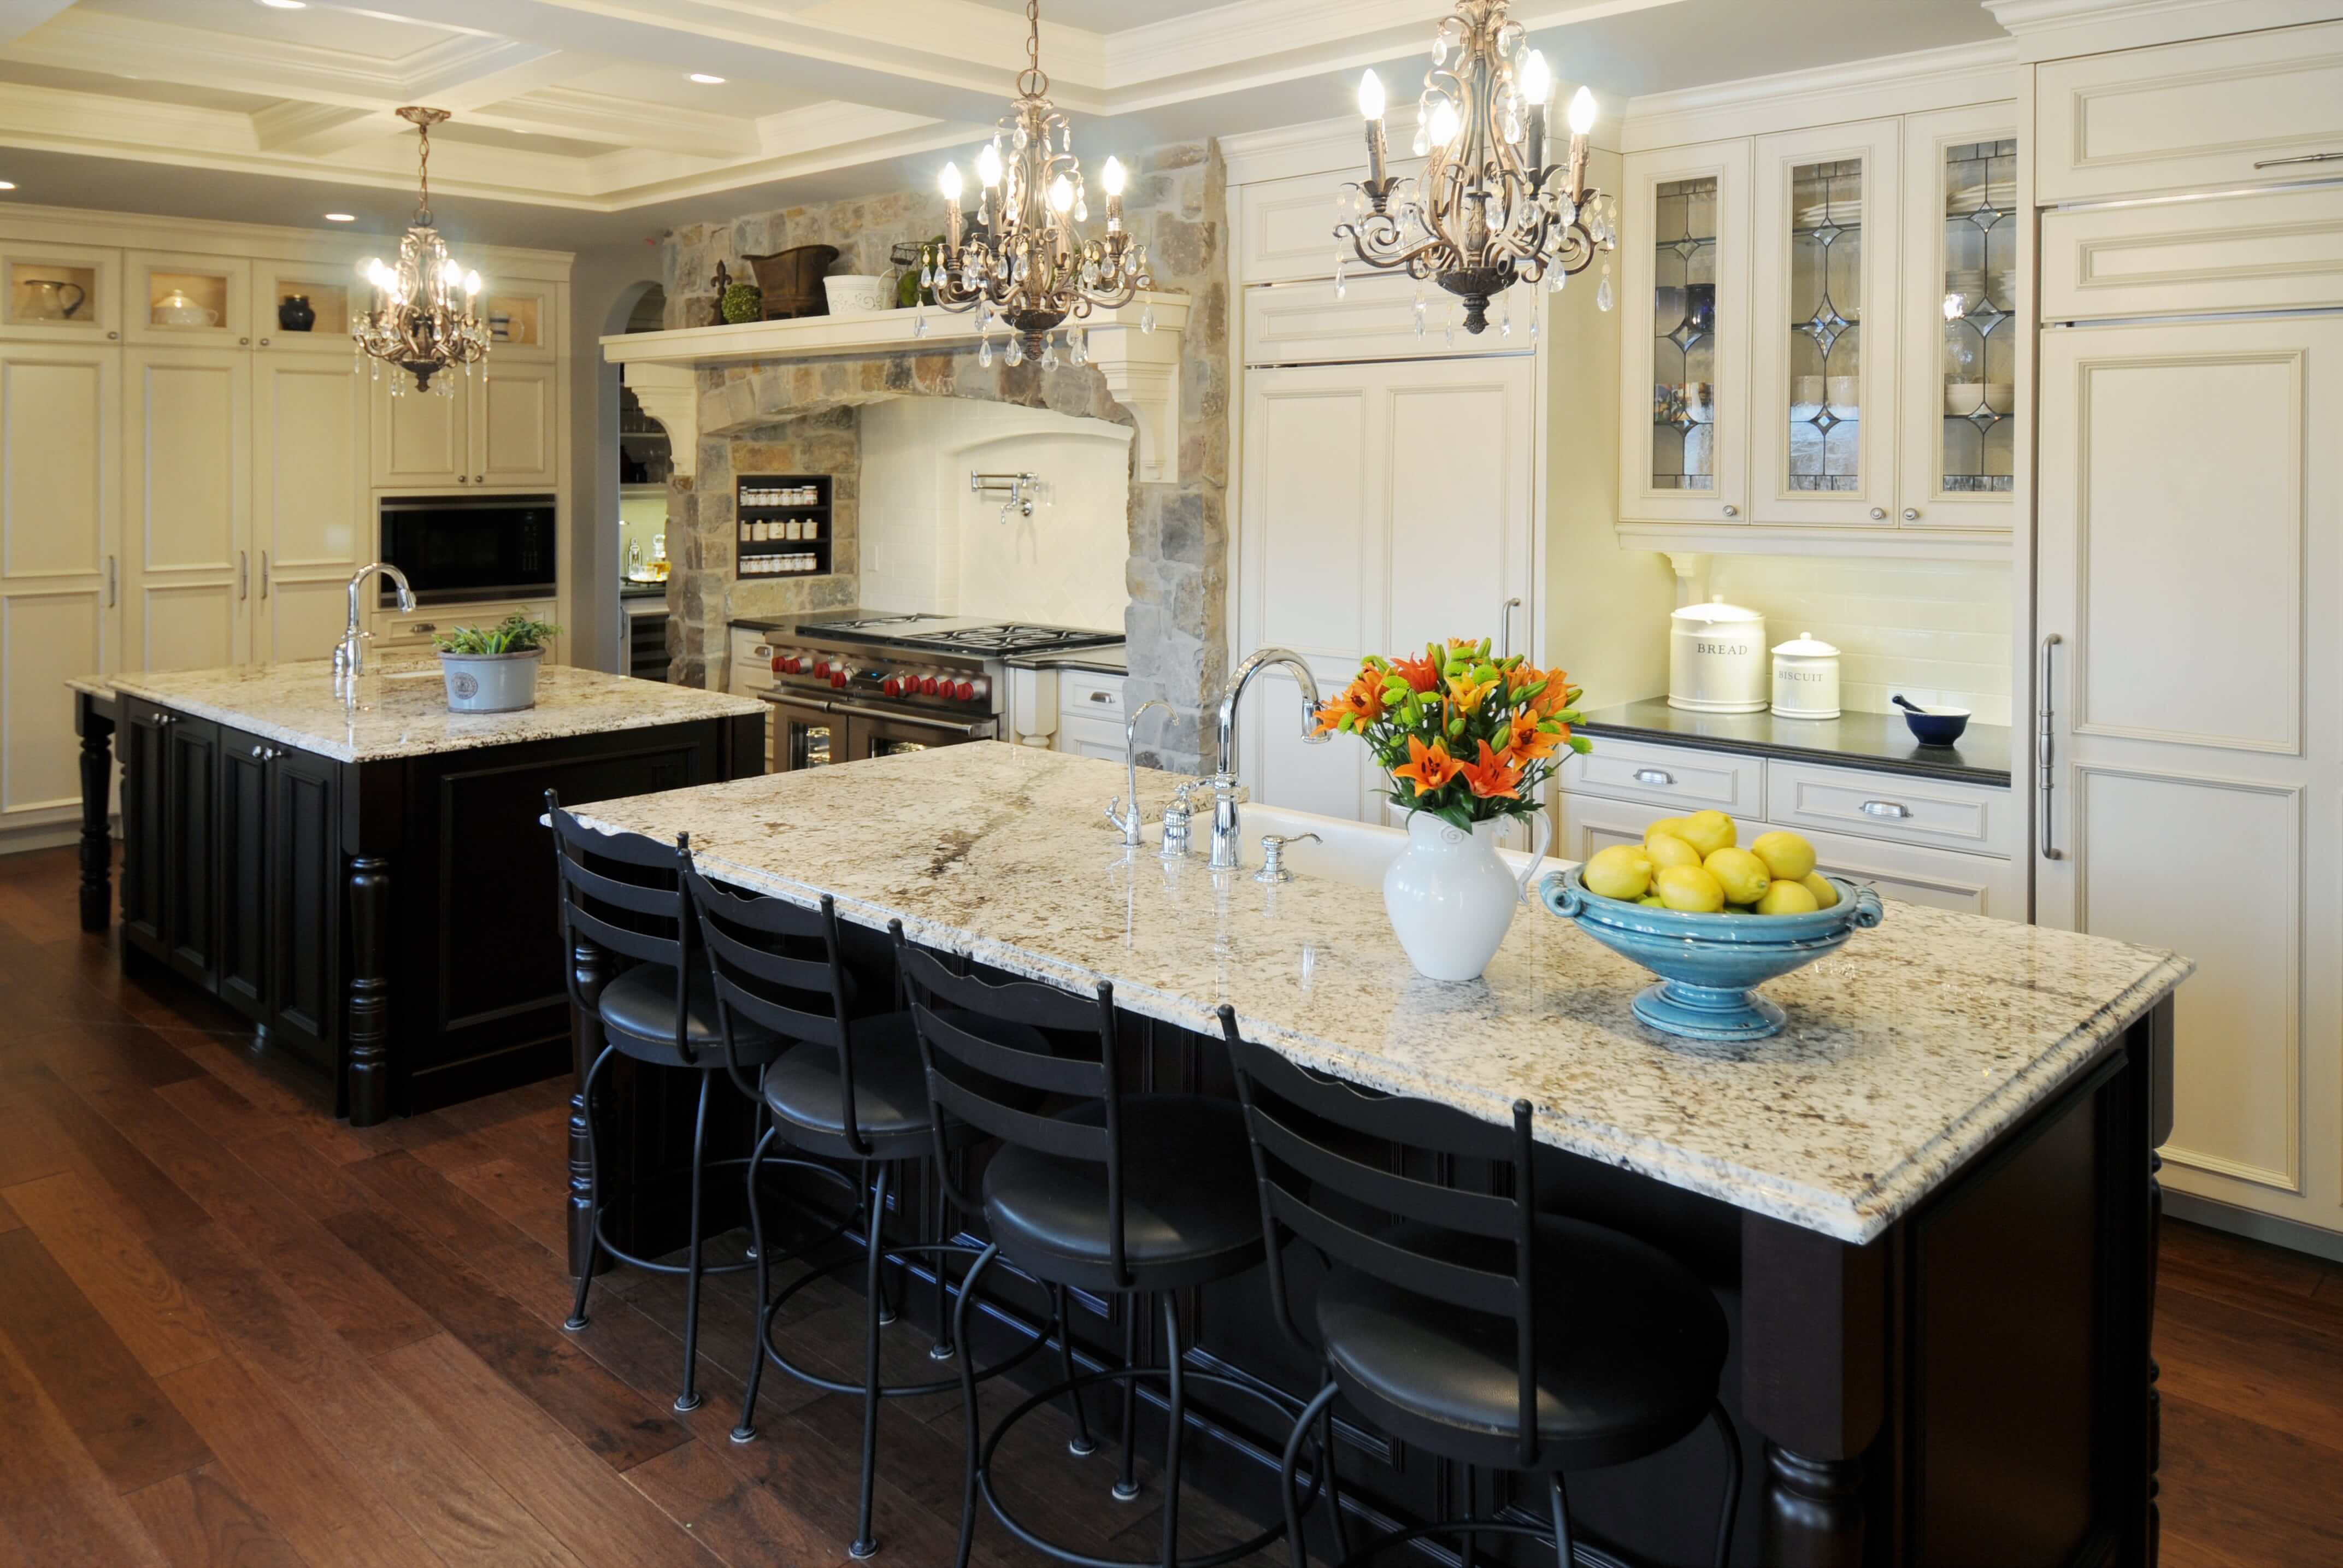 Fullsize Of Kitchen With Island Ideas